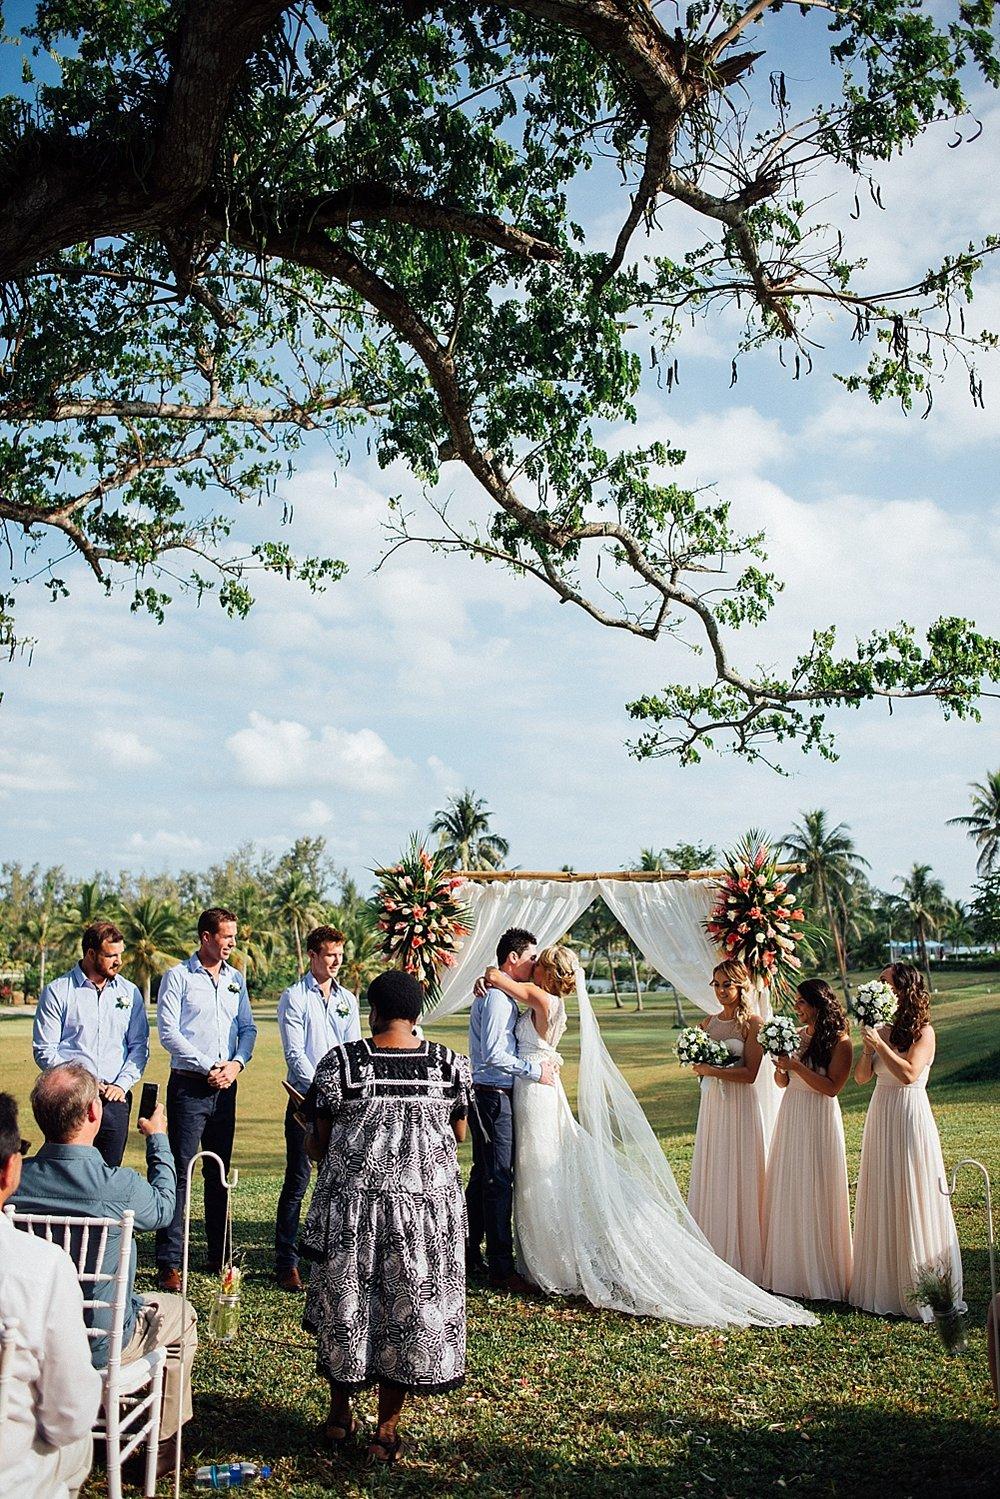 Deanna-Michael-WeddingPhotography-HolidayInnResort-GroovyBanana-VanuatuPhotographers_0011.jpg